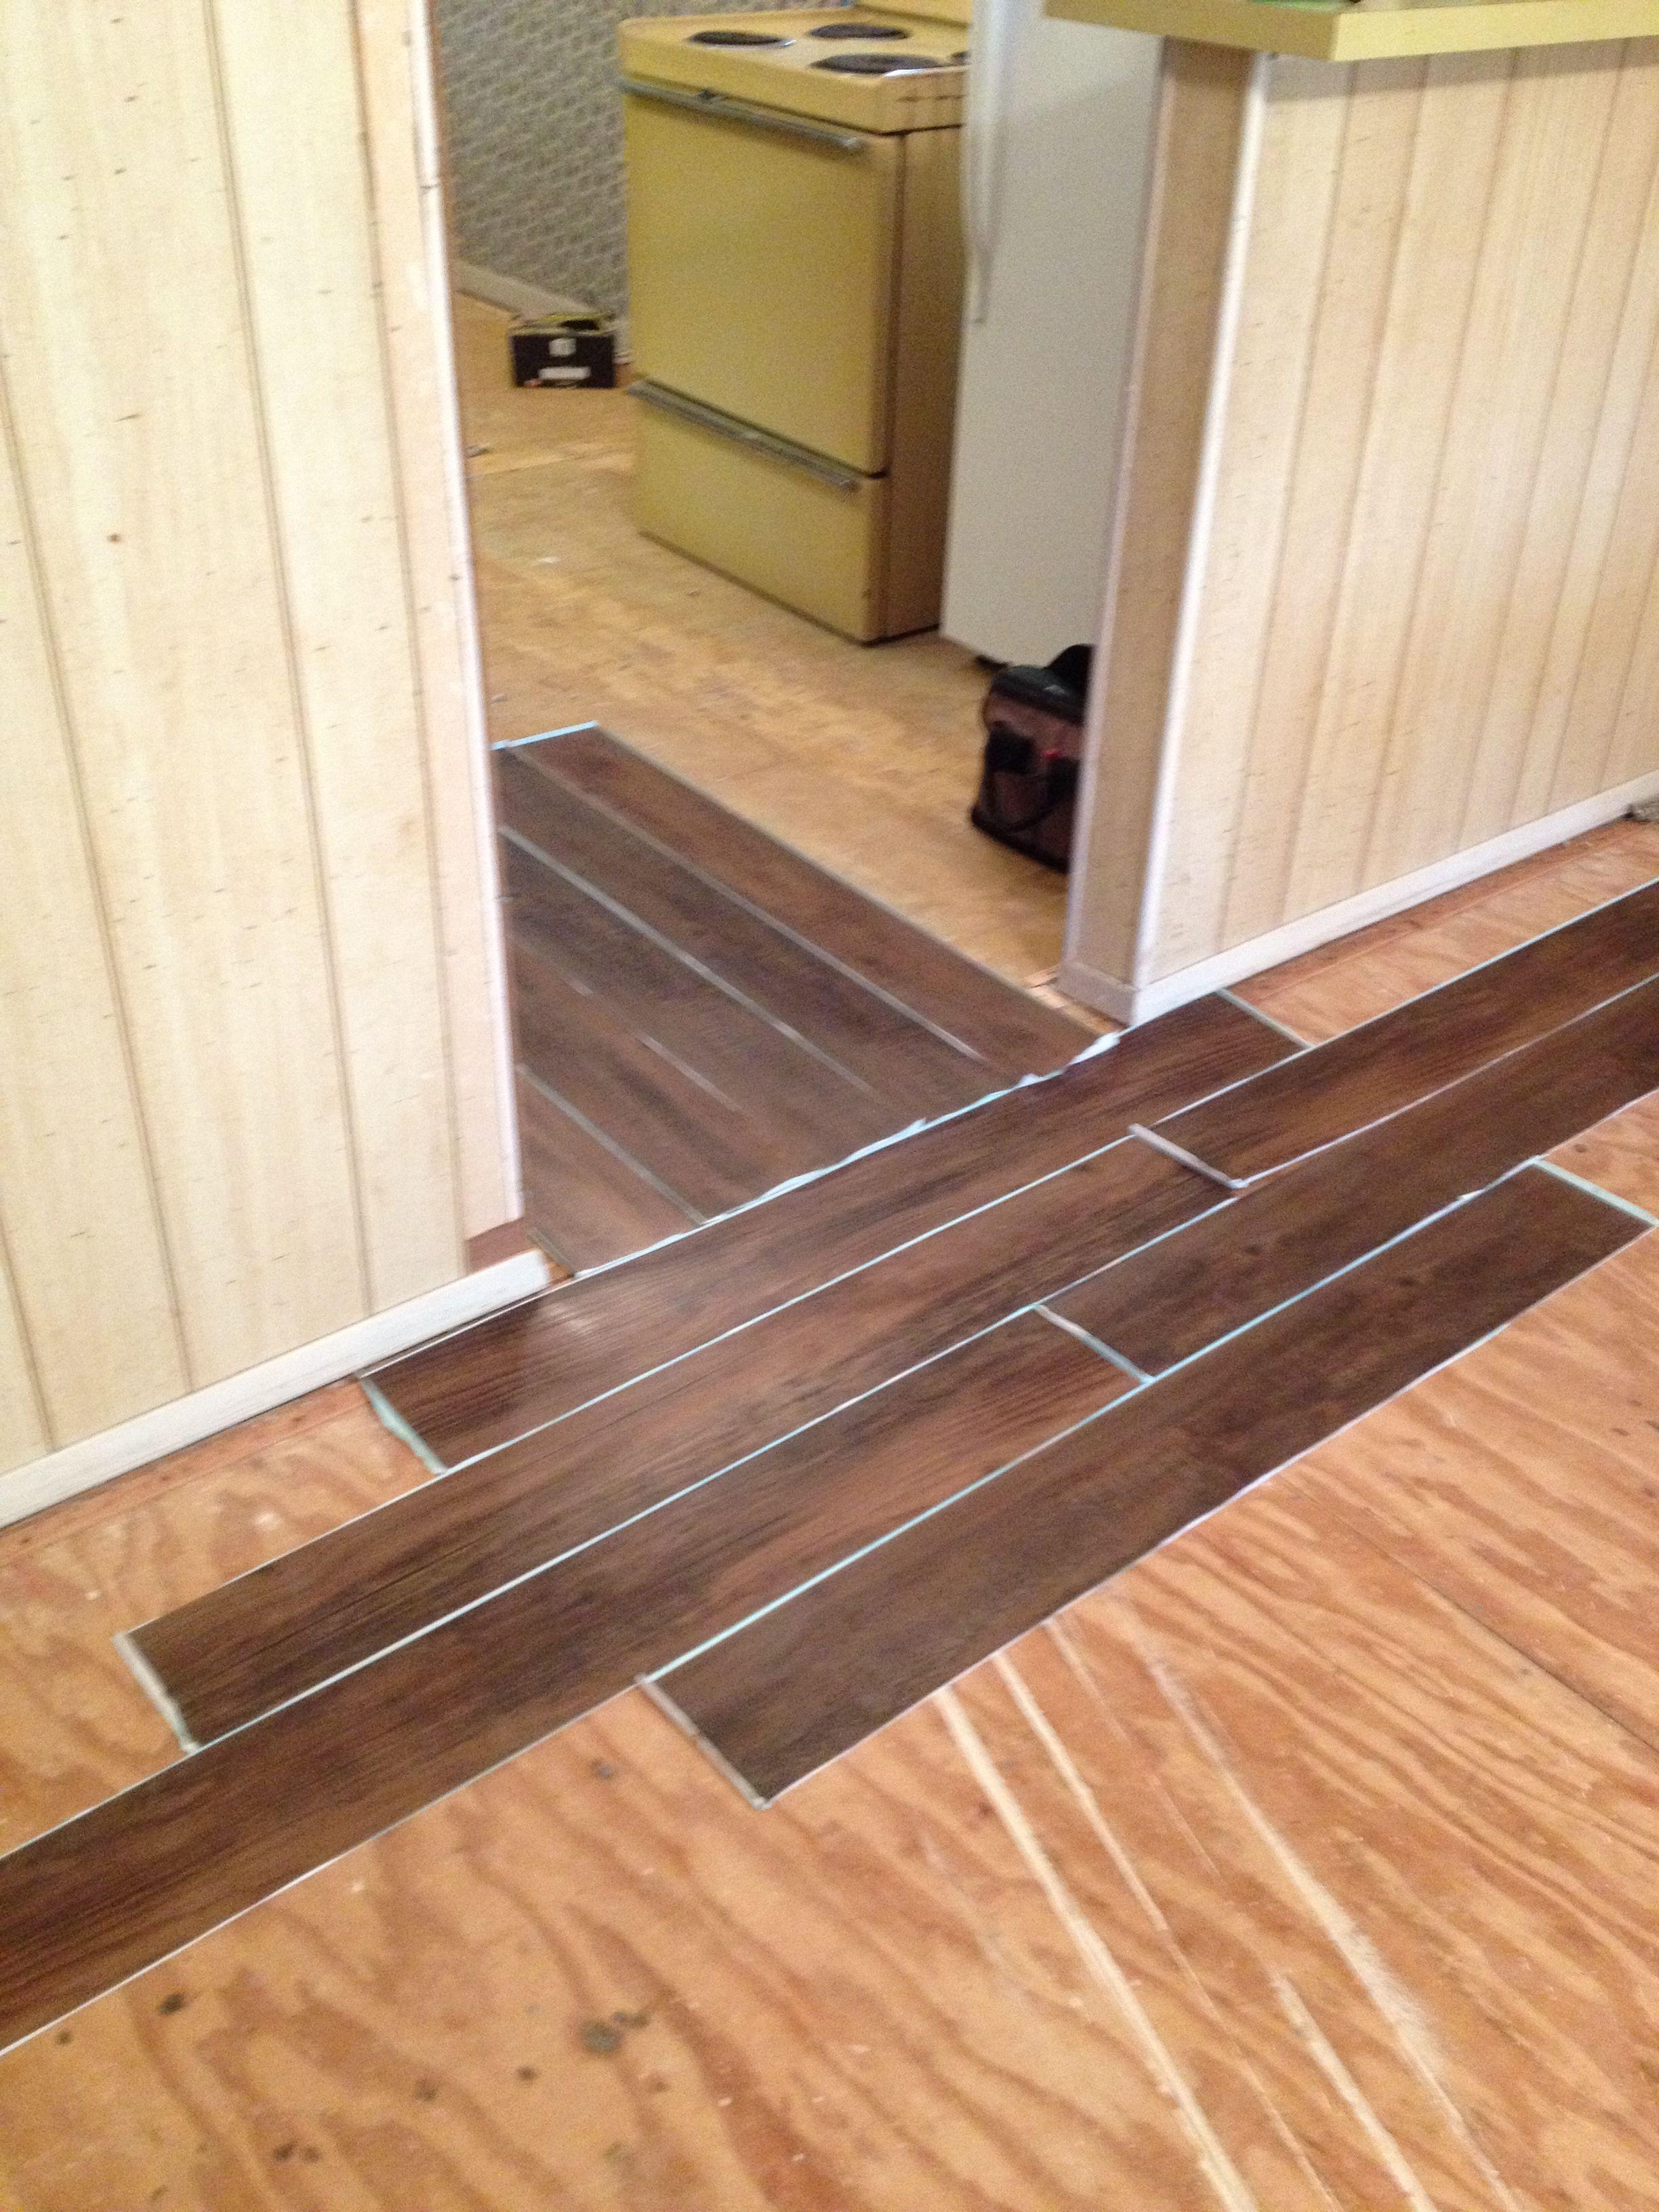 Laminate Flooring Direction Change Azl Spot In 2020 Installing Hardwood Floors Flooring Transition Flooring